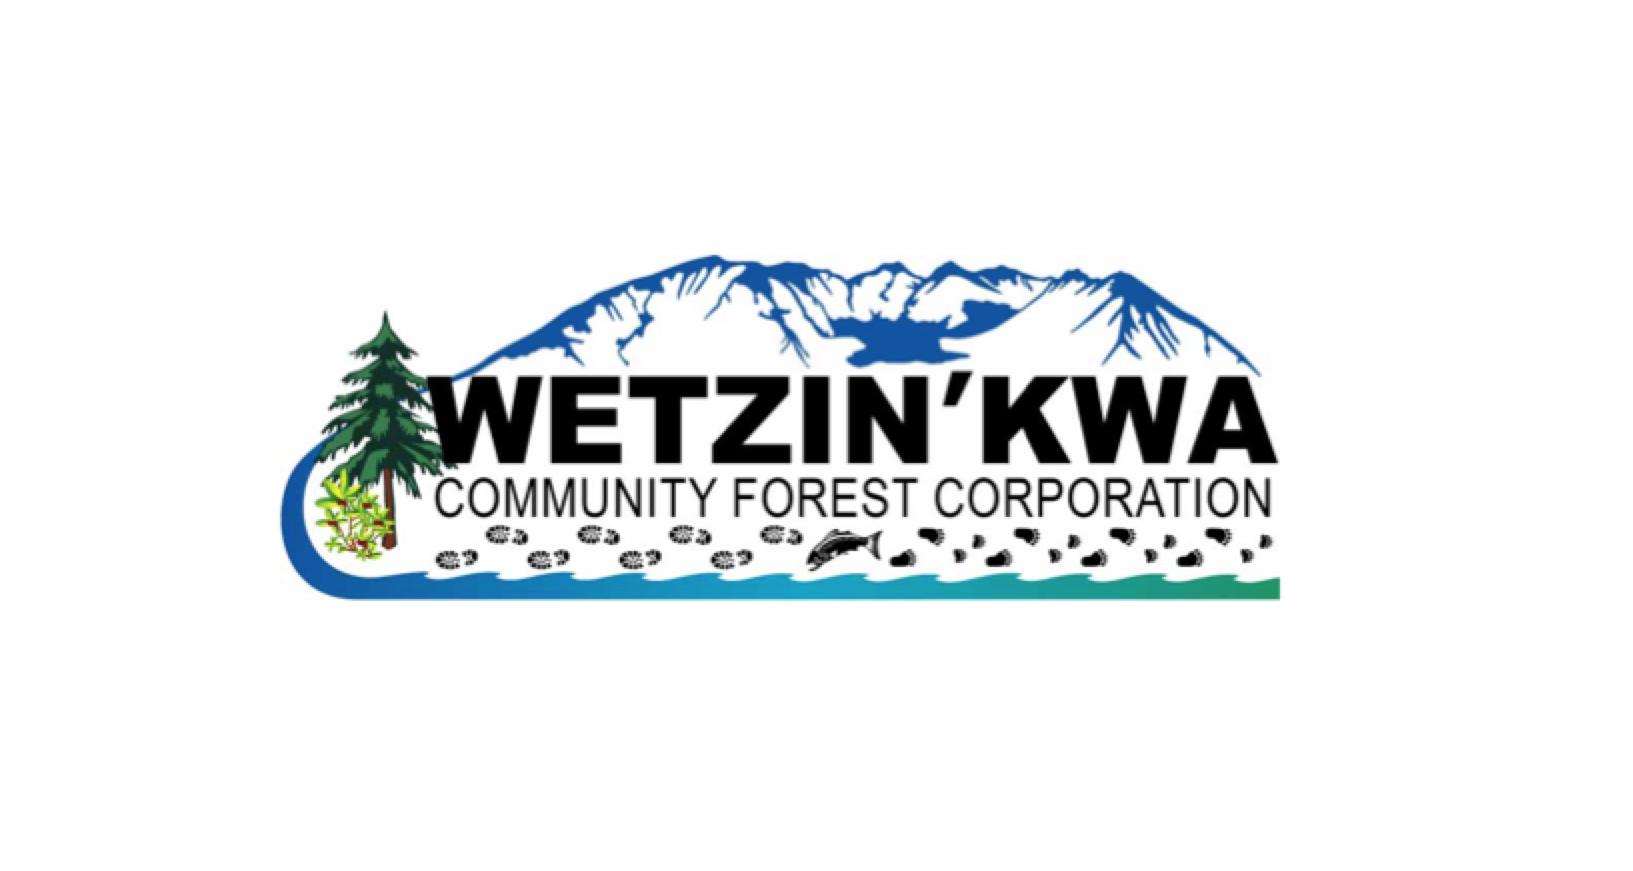 Wetzin'kwa Community Forest Corp.